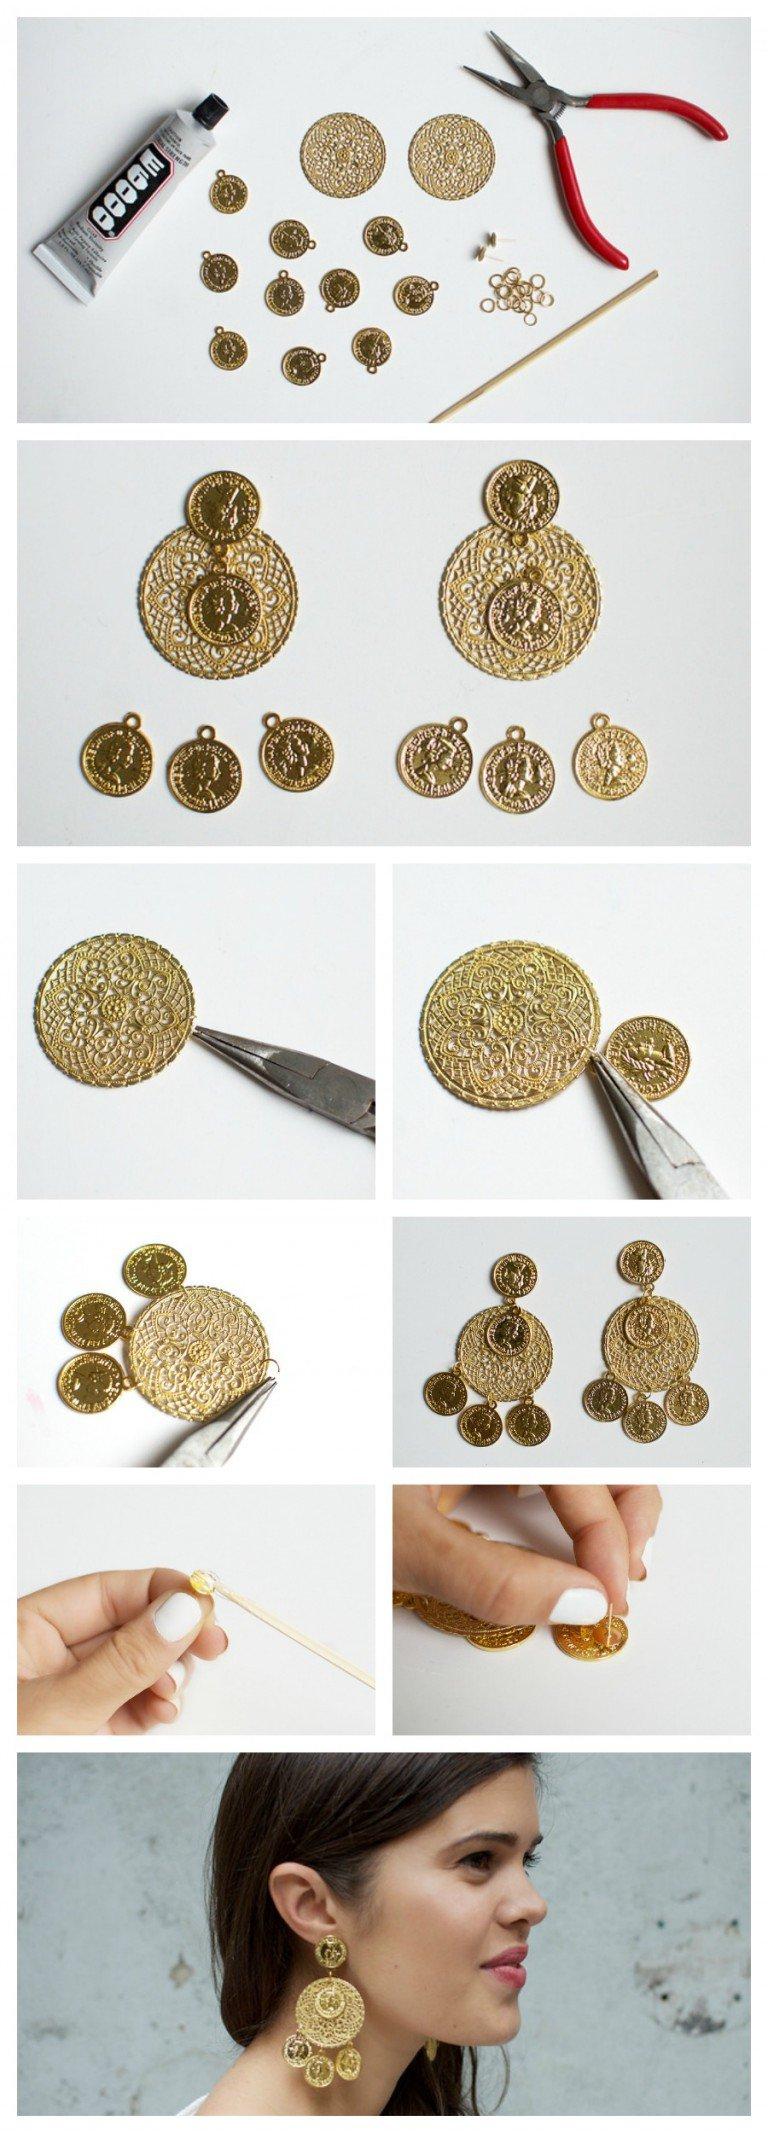 Custom made earring ideas